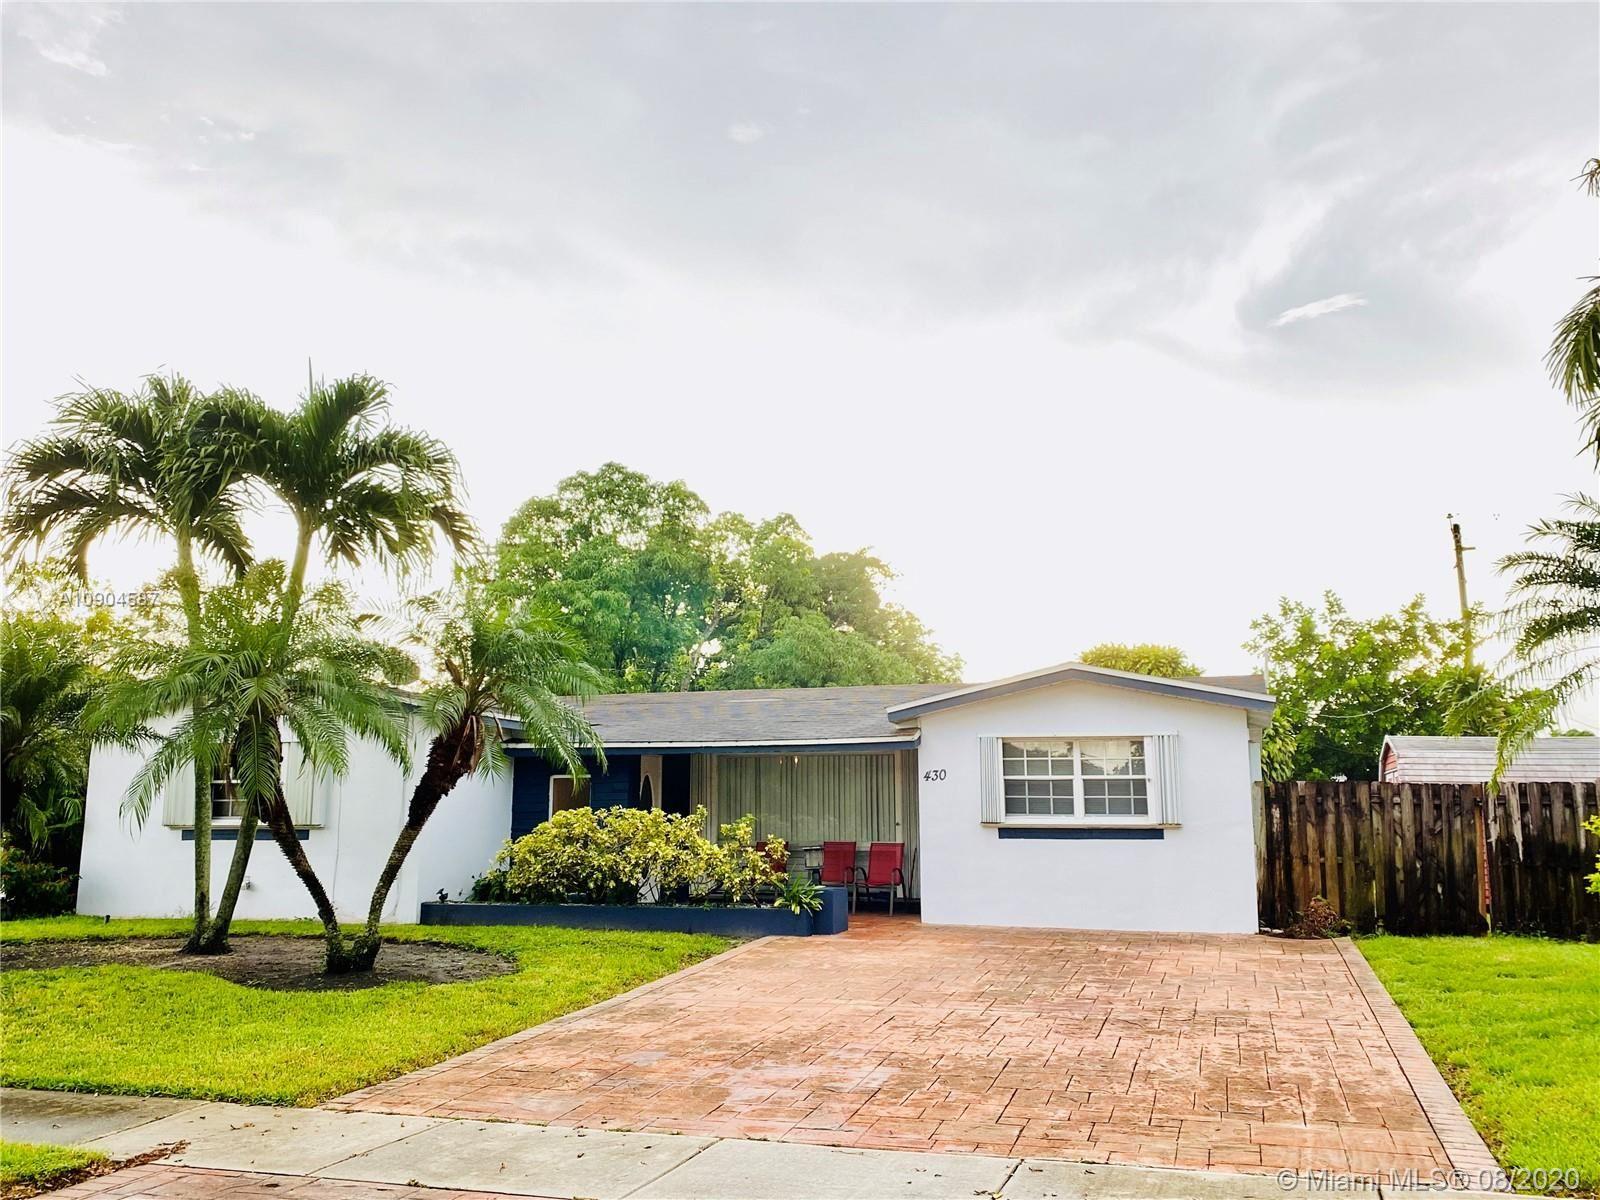 430 SW 70th Ave, Pembroke Pines, FL 33023 - #: A10904587